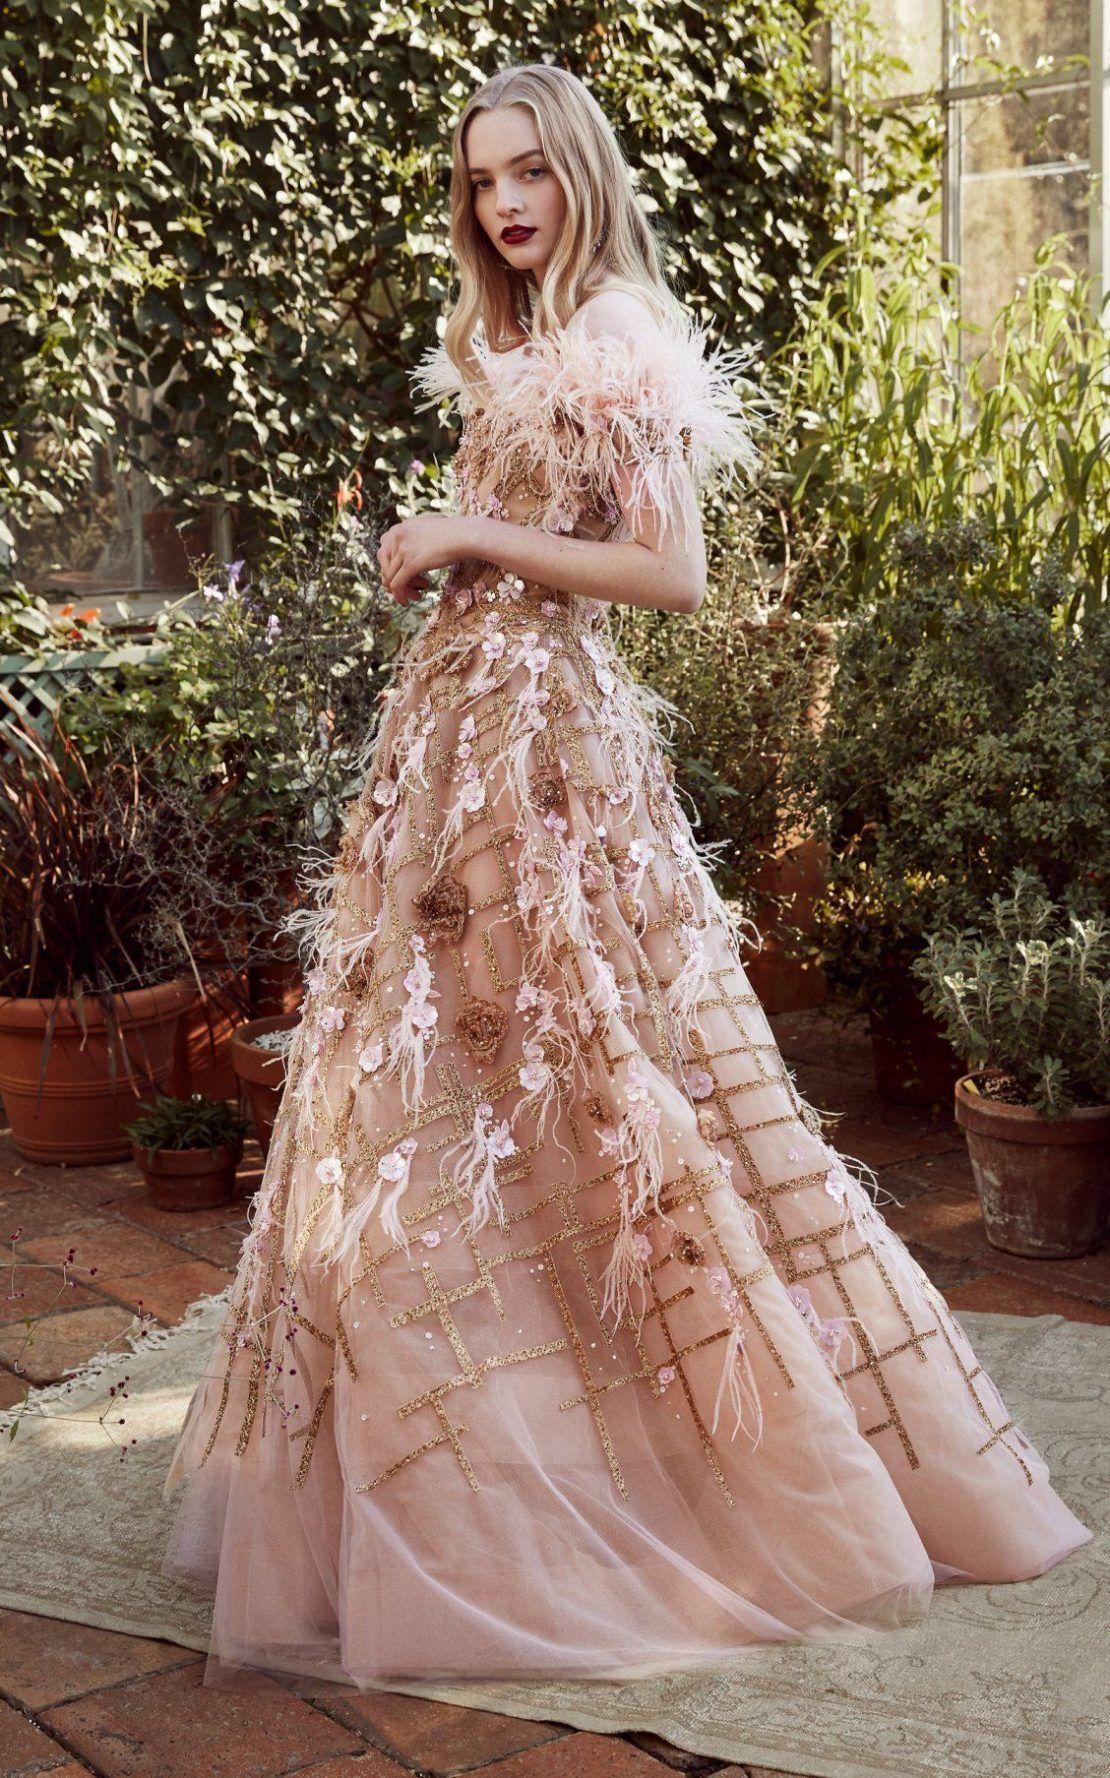 Feather Dress Romantic Look